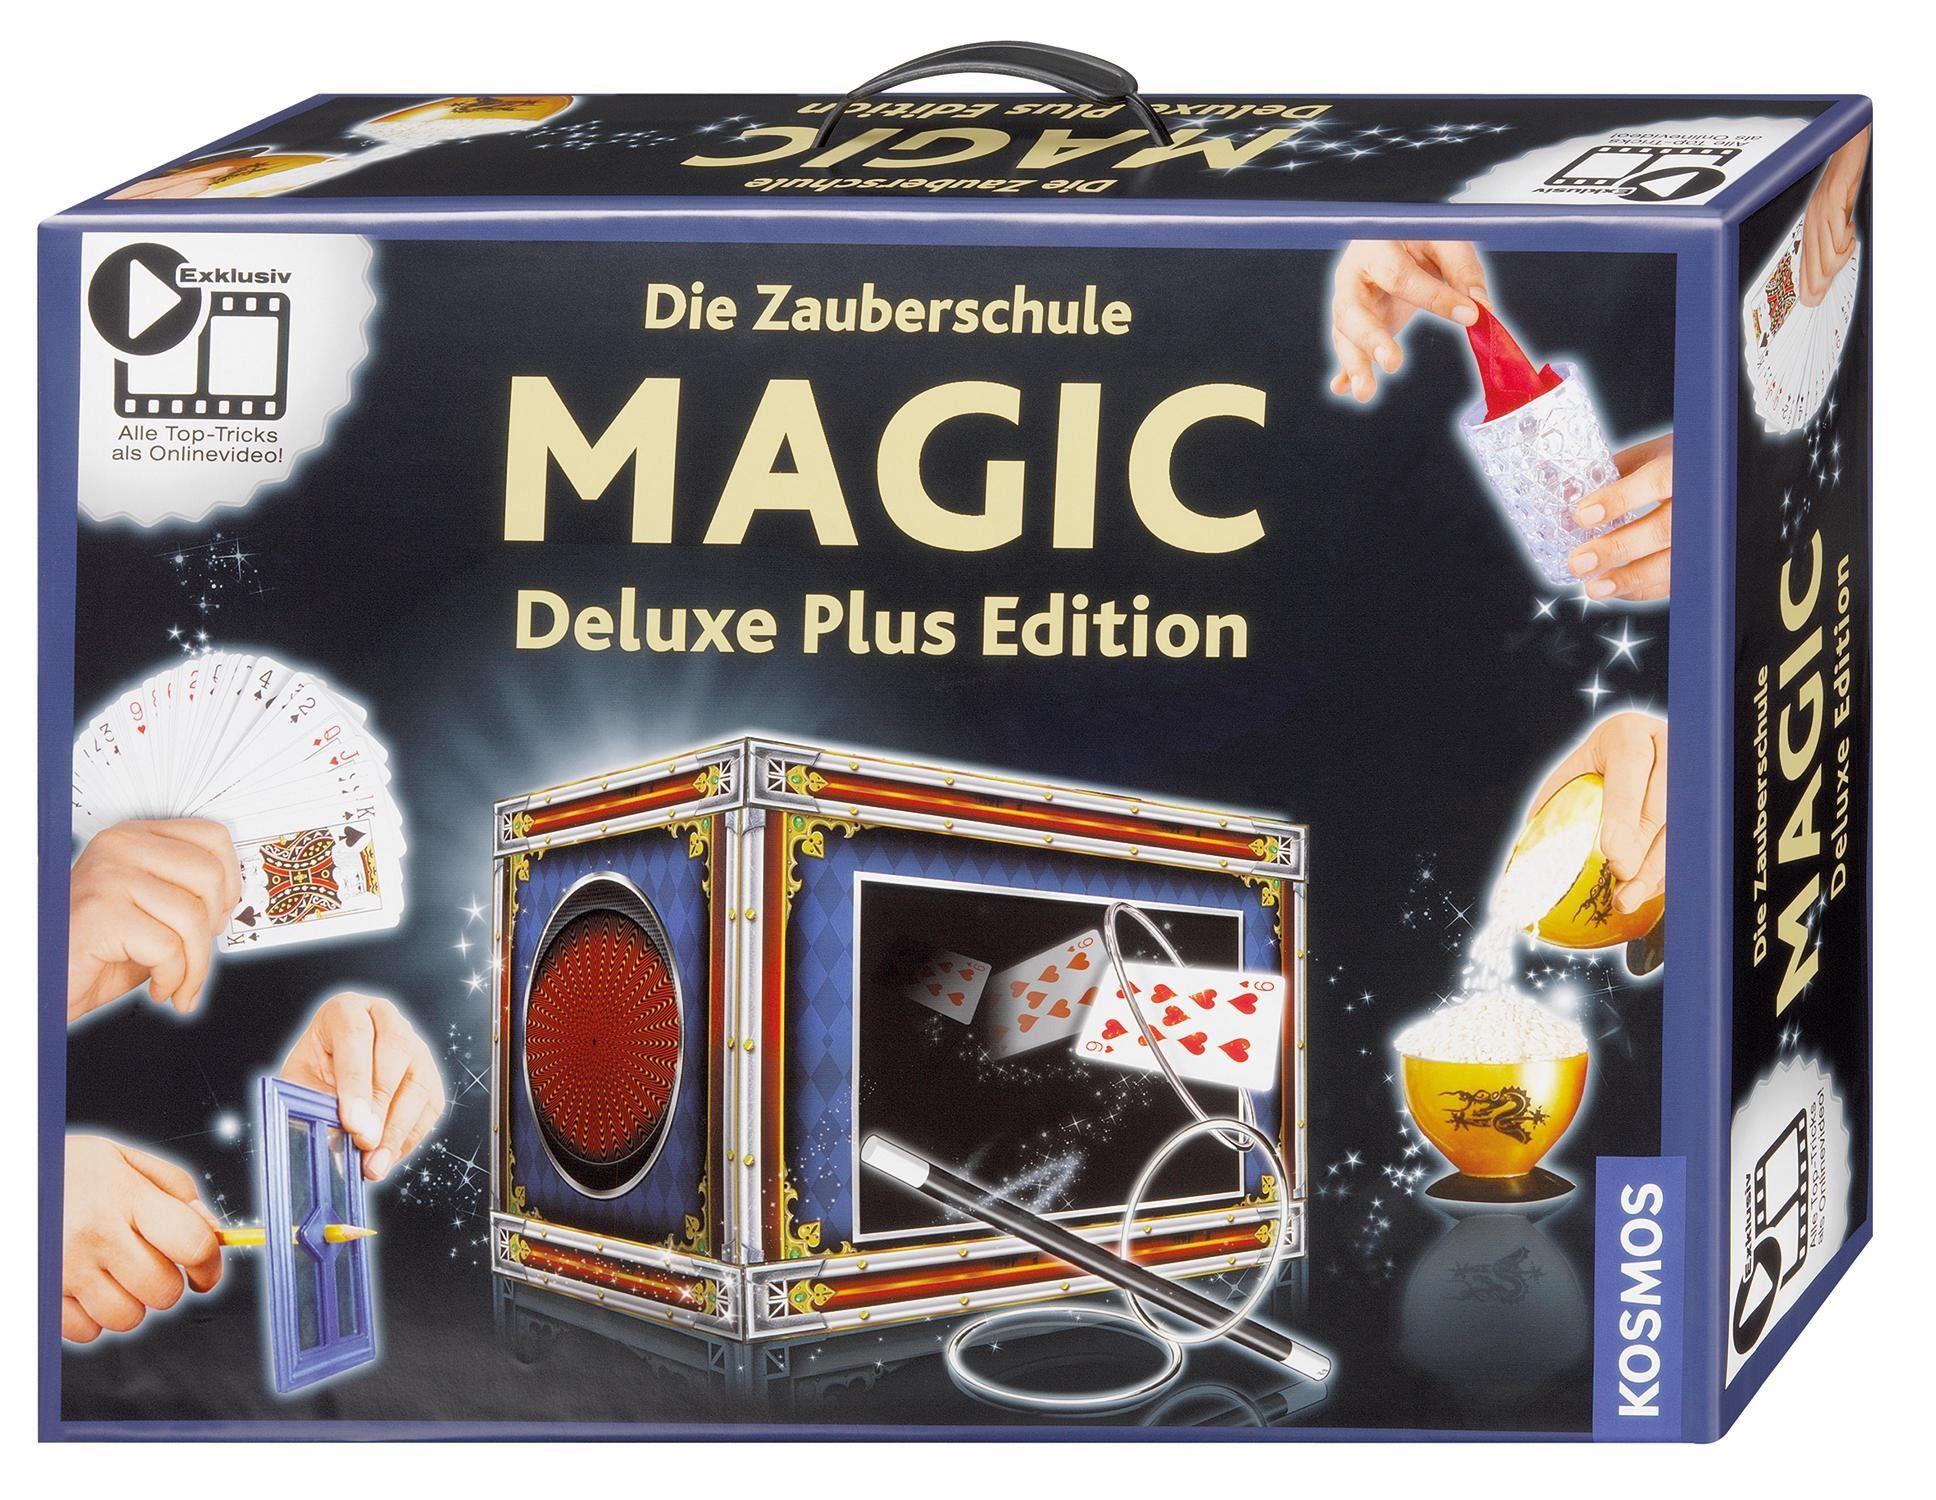 Kosmos zauberkasten die zauberschule magic deluxe plus edition